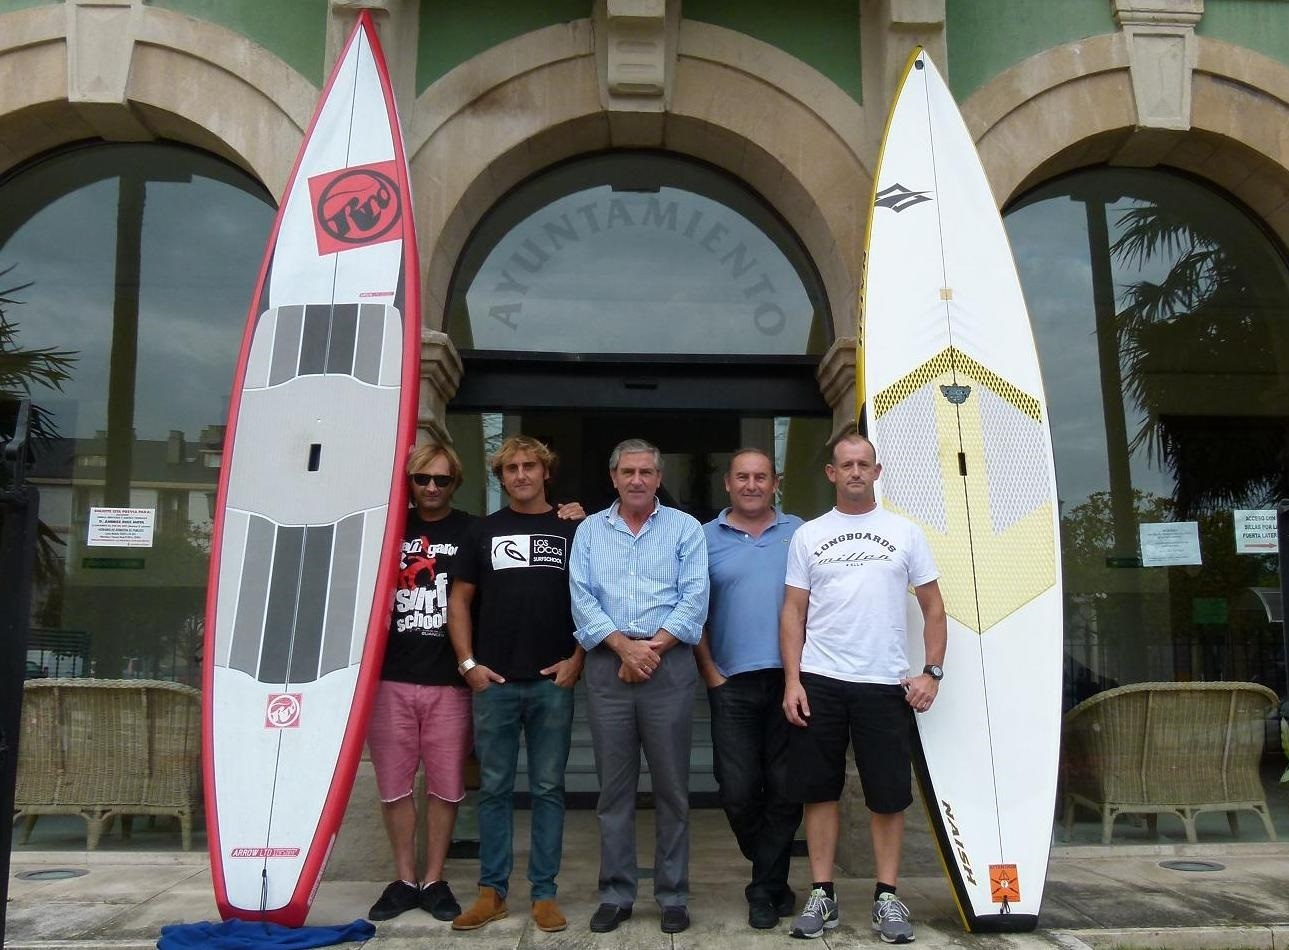 El circuito europeo SUP-RACE de surf con remos visita Cantabria este fin de semana